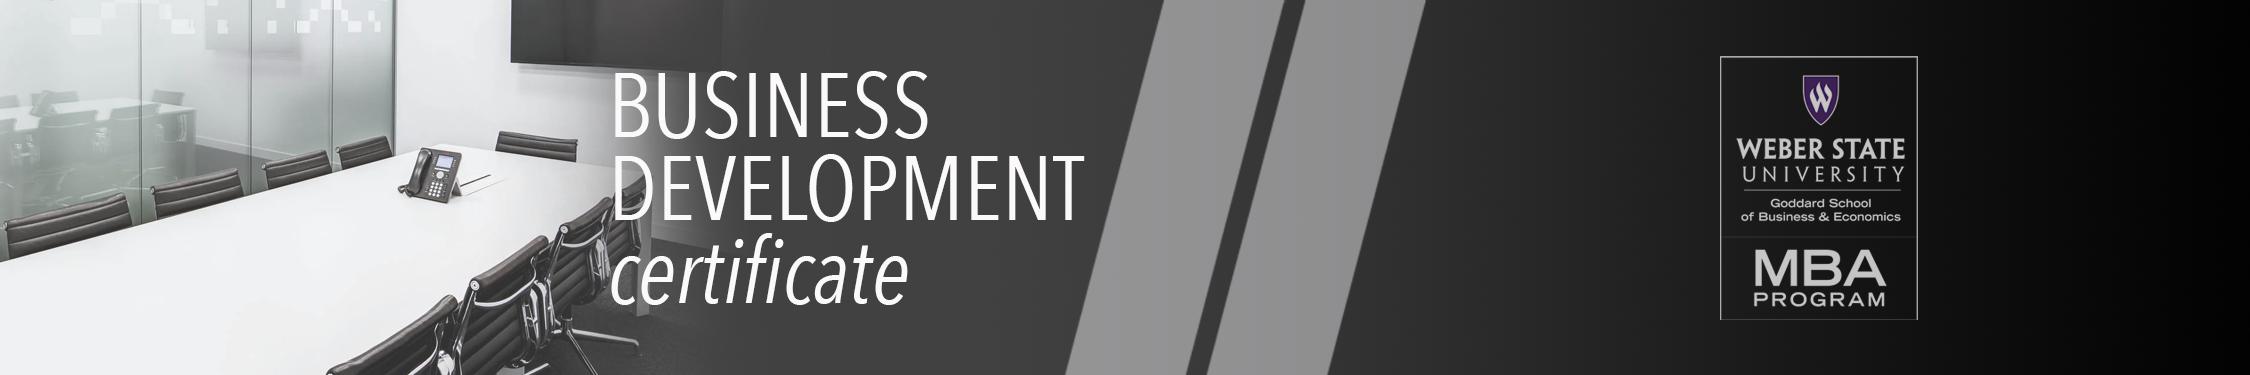 Business Development Certificate